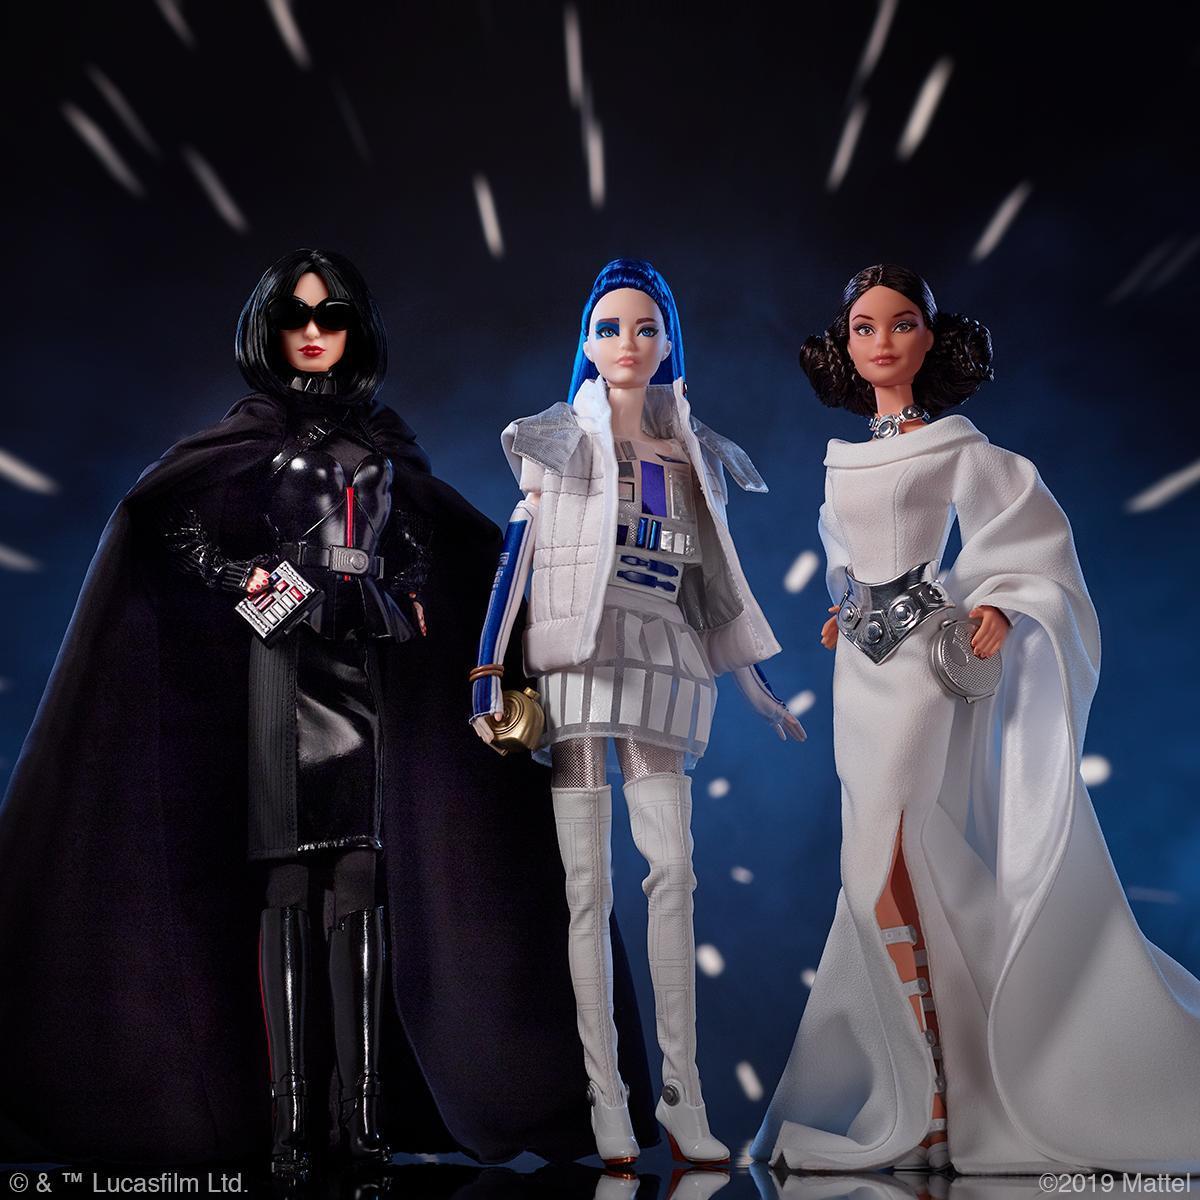 Barbie Star Wars Mattel figures